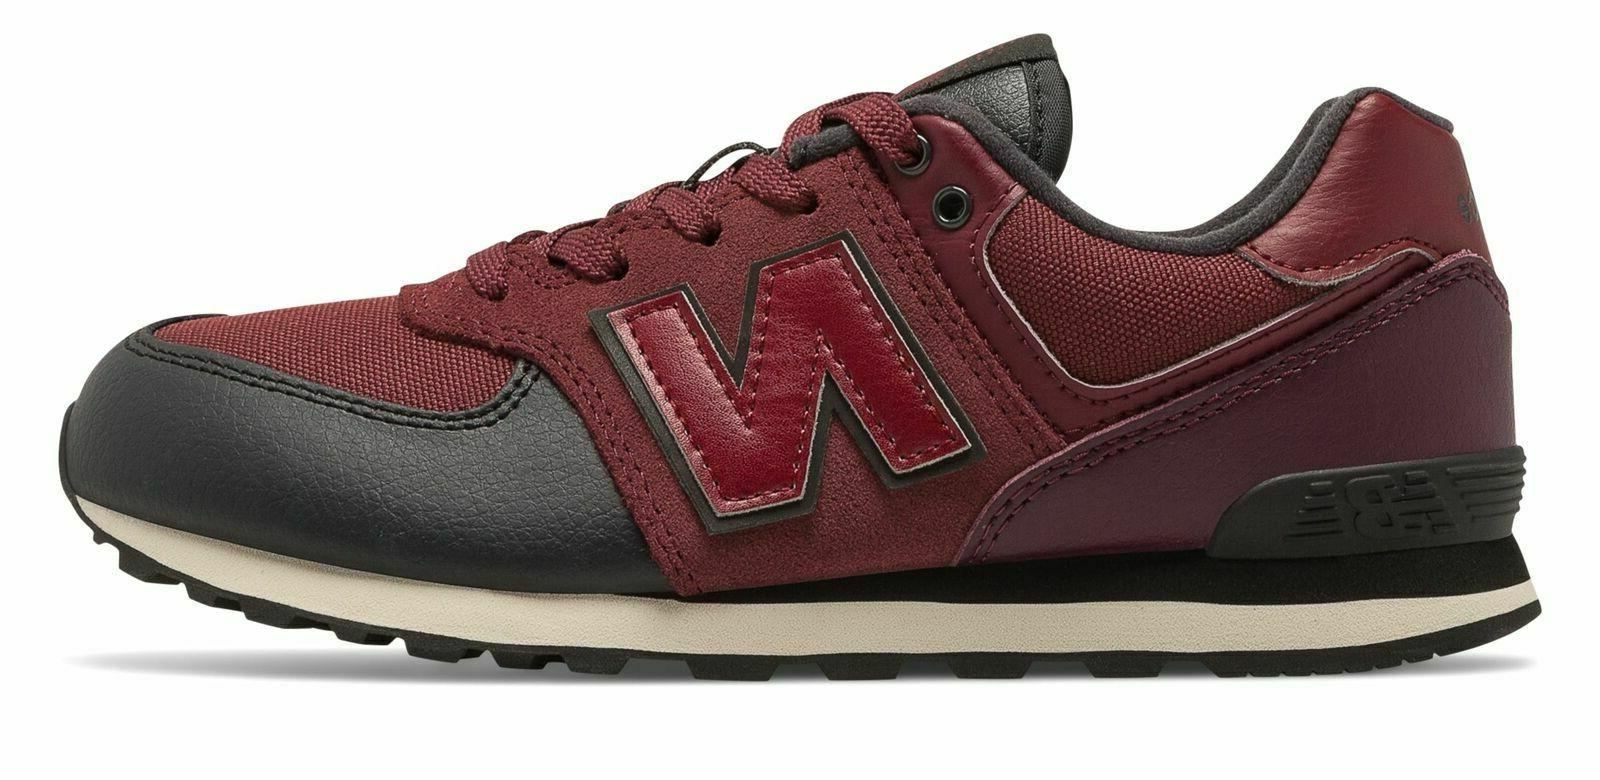 New Balance Men's ML574EGB Classic Casual Sneakers, Burgundy